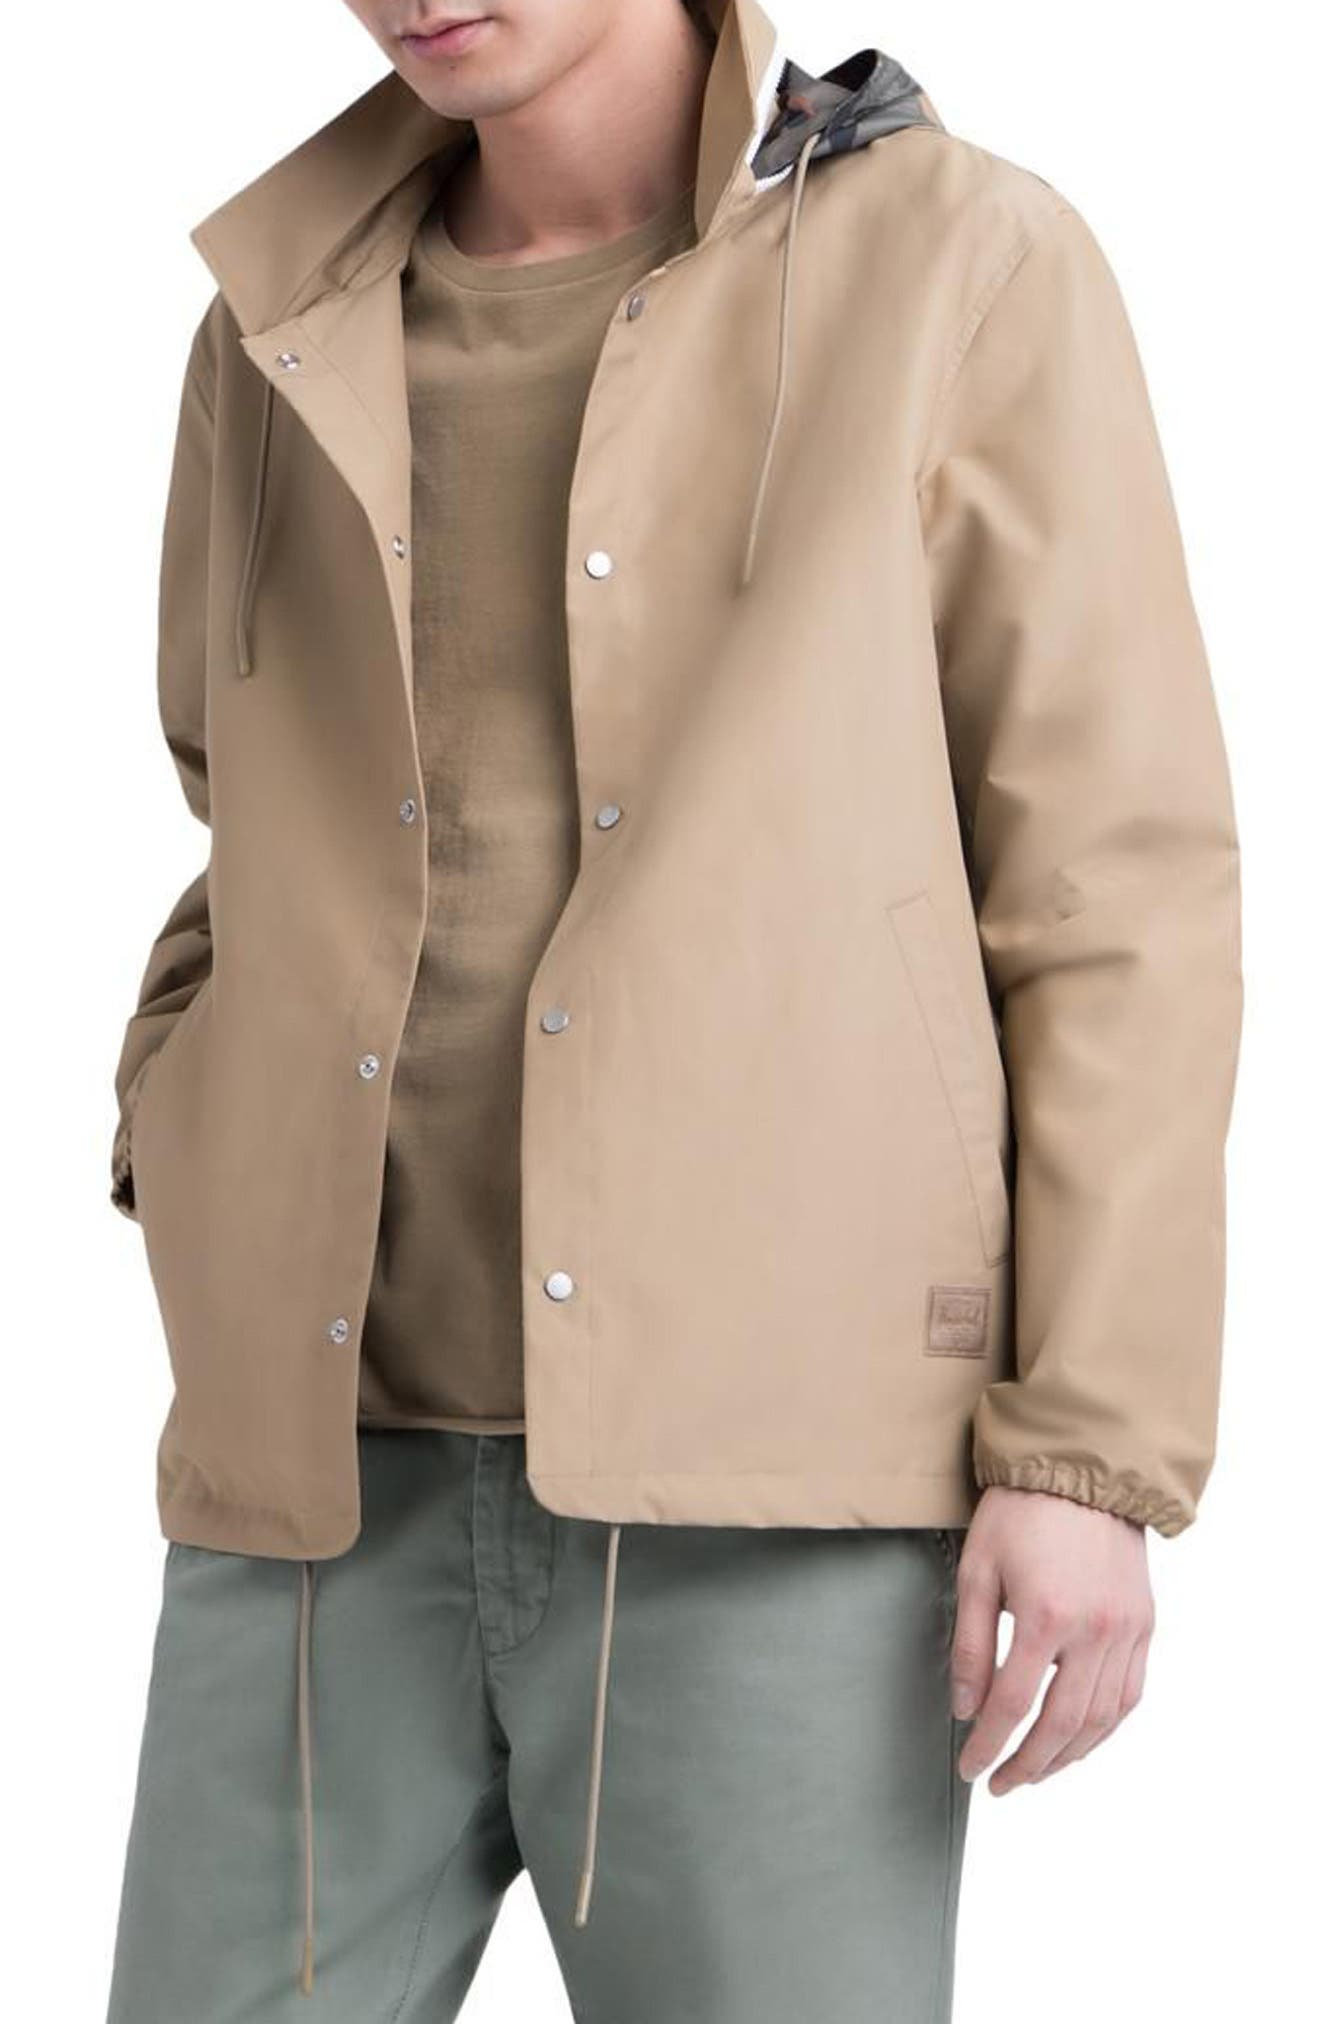 Herschel Supply Co. Hooded Coach's Jacket